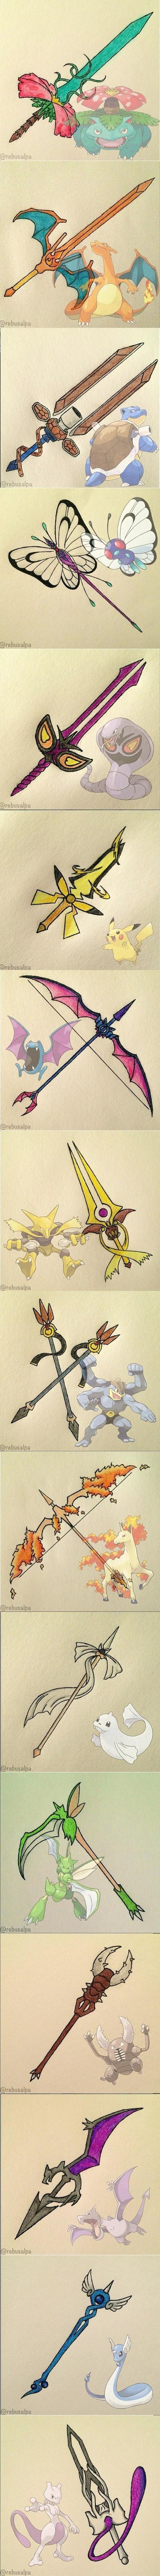 best pokémon images on pinterest pokemon stuff videogames and